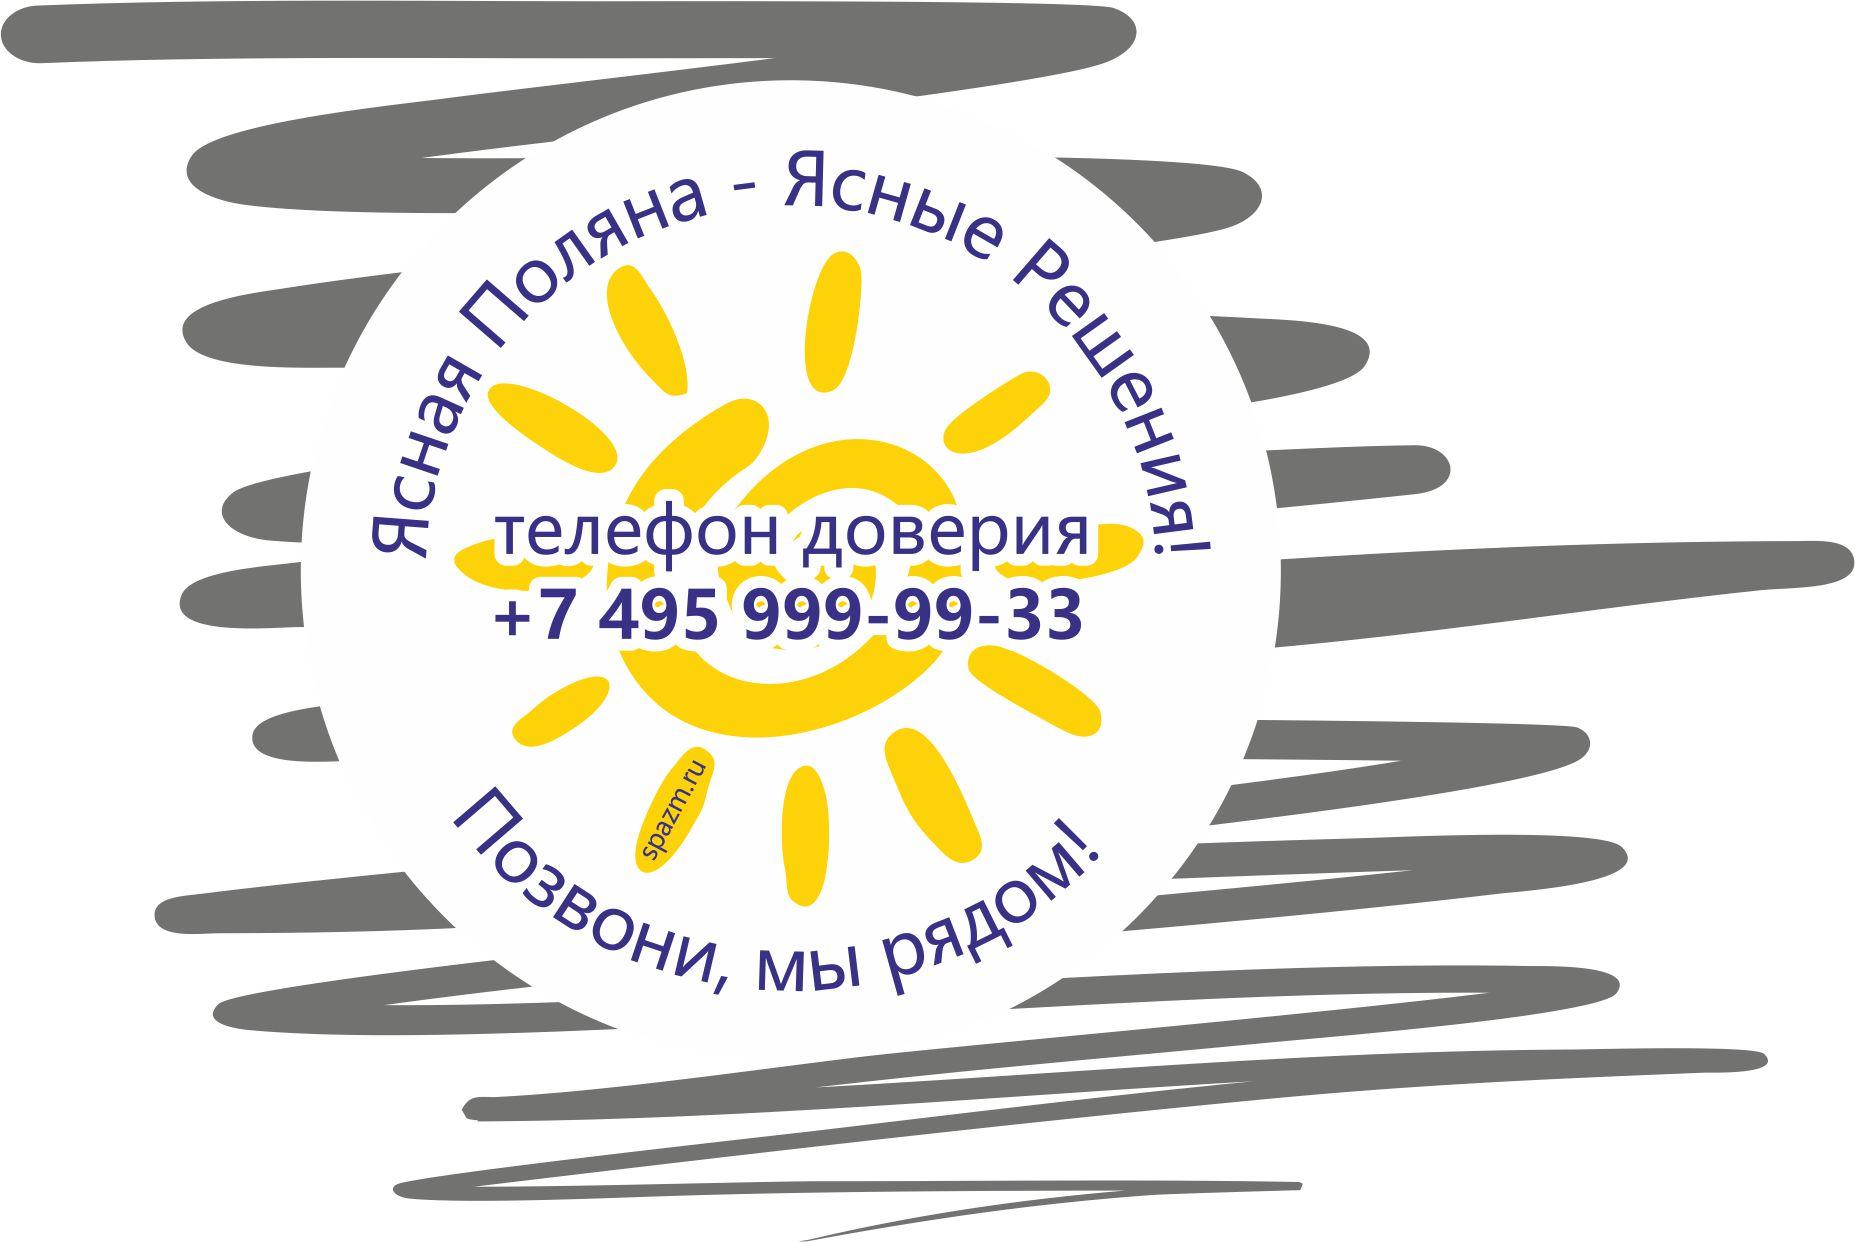 Логотип для сайта психологического телефона доверия фото f_85157b2ce18973aa.jpg